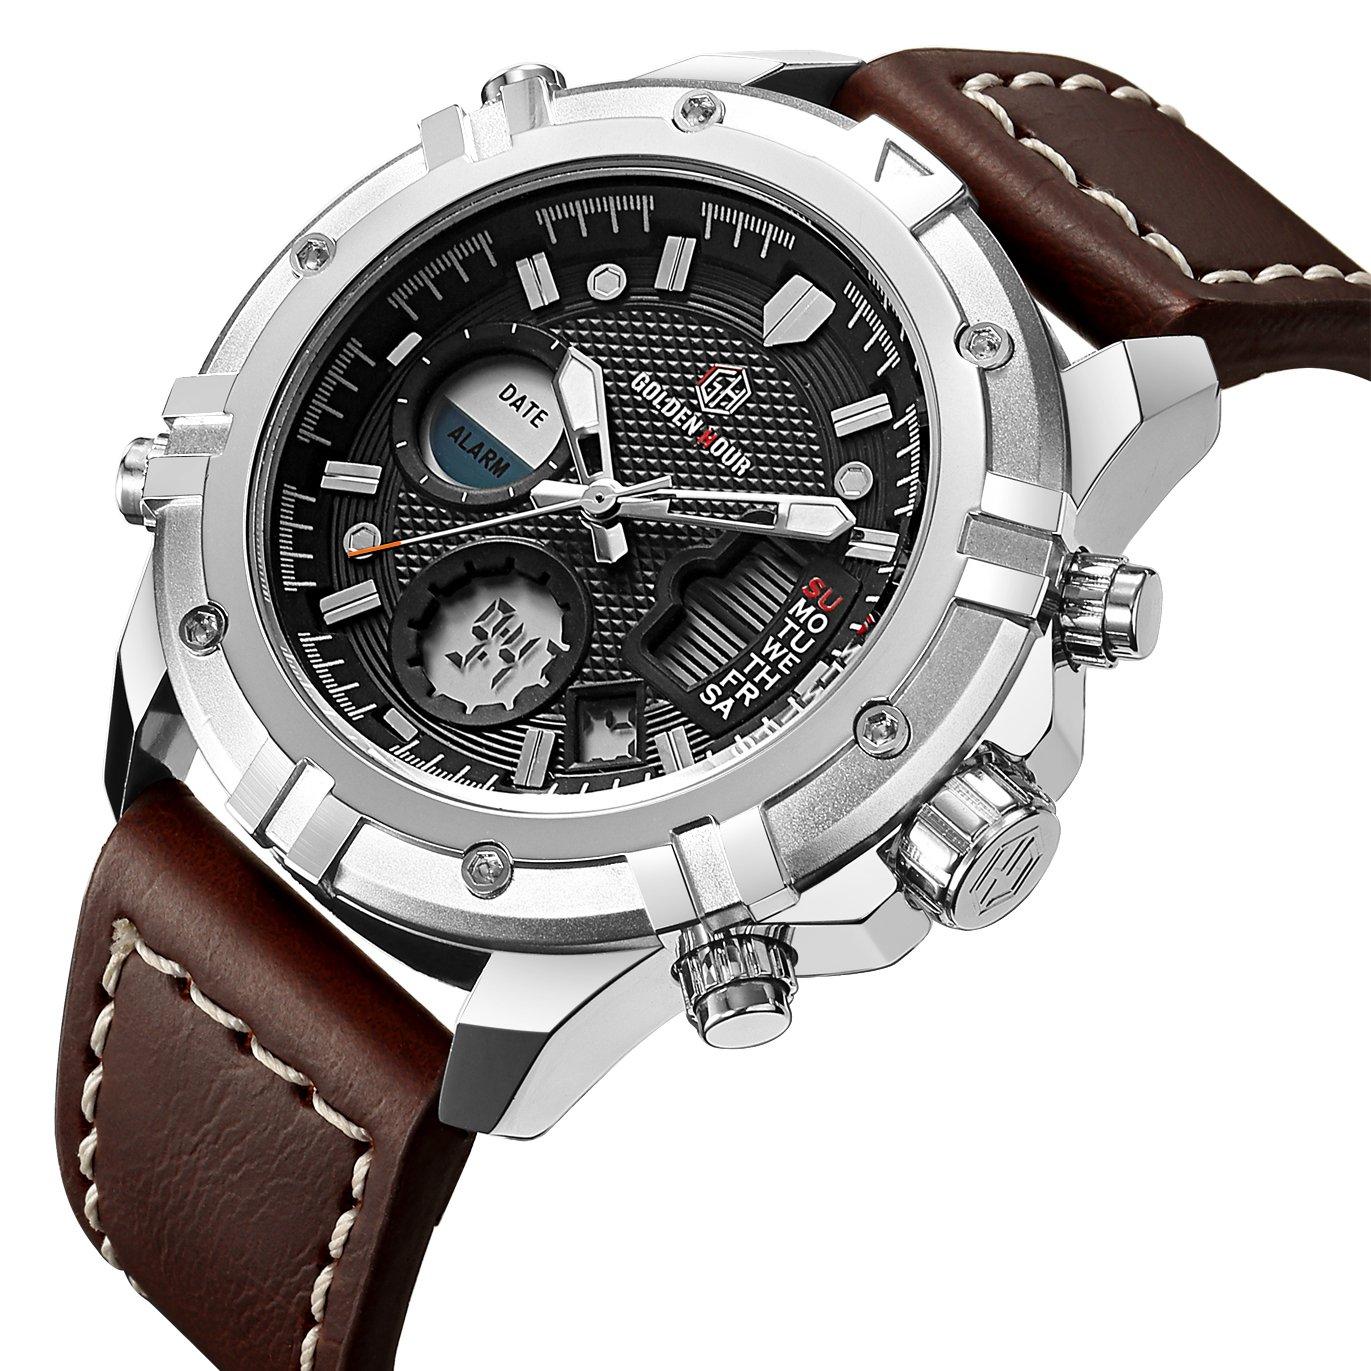 Relojes de Cuarzo Analš®gicos Digitales Deporte para Hombre para Hombres cronš®grafo Militar Reloj Impermeable (Silver-110): Amazon.es: Relojes